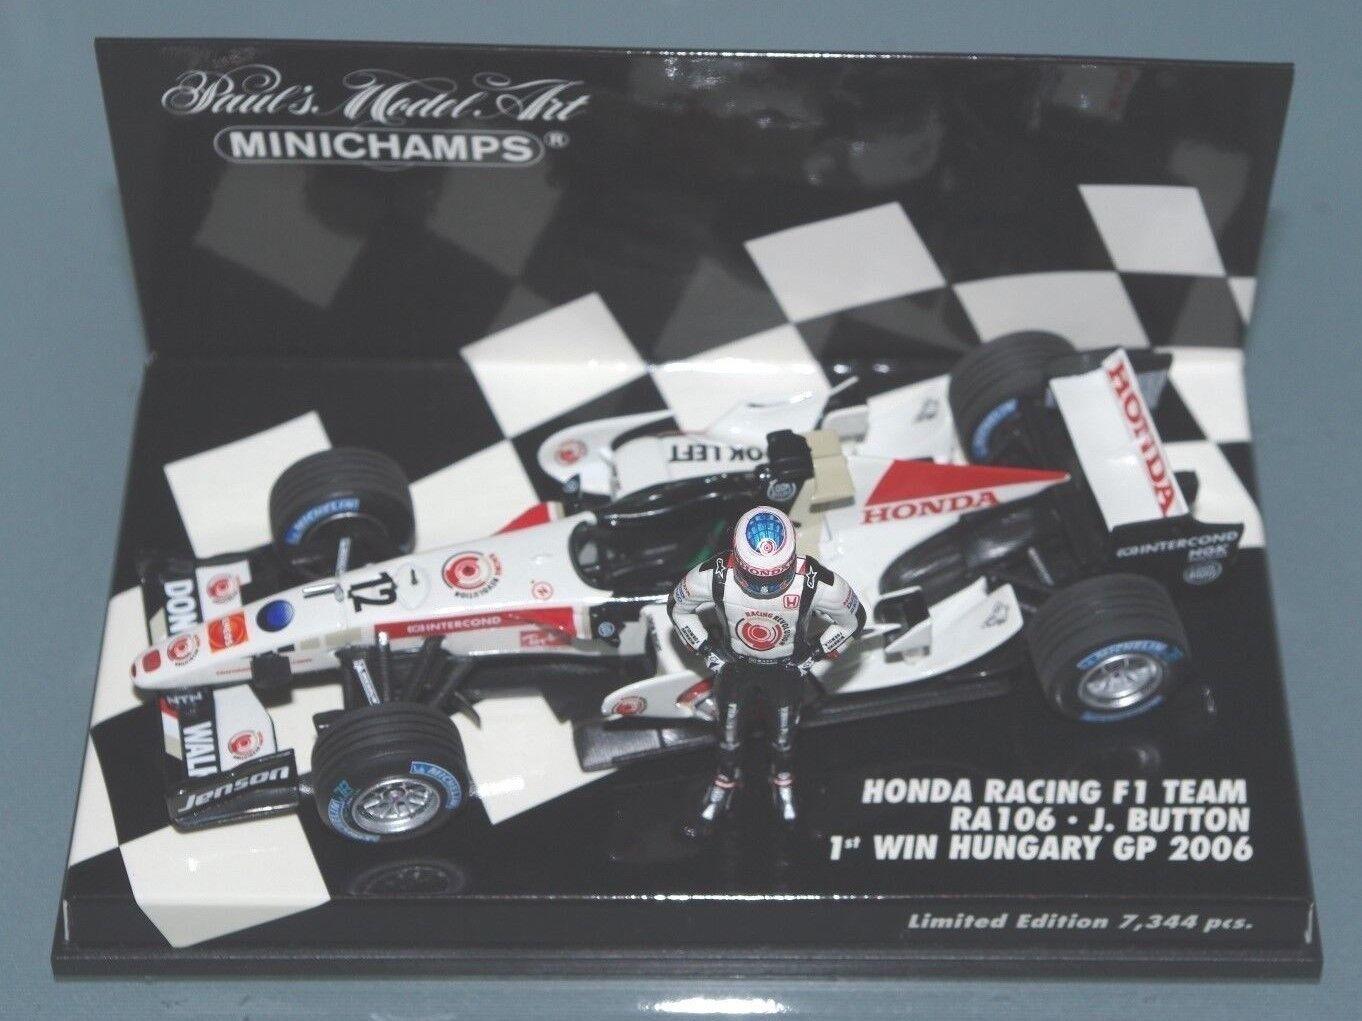 Minichamps F1 1 43 HONDA RACING RA106 JENSON BUTTON 1st WIN HUNGARY GP 2006